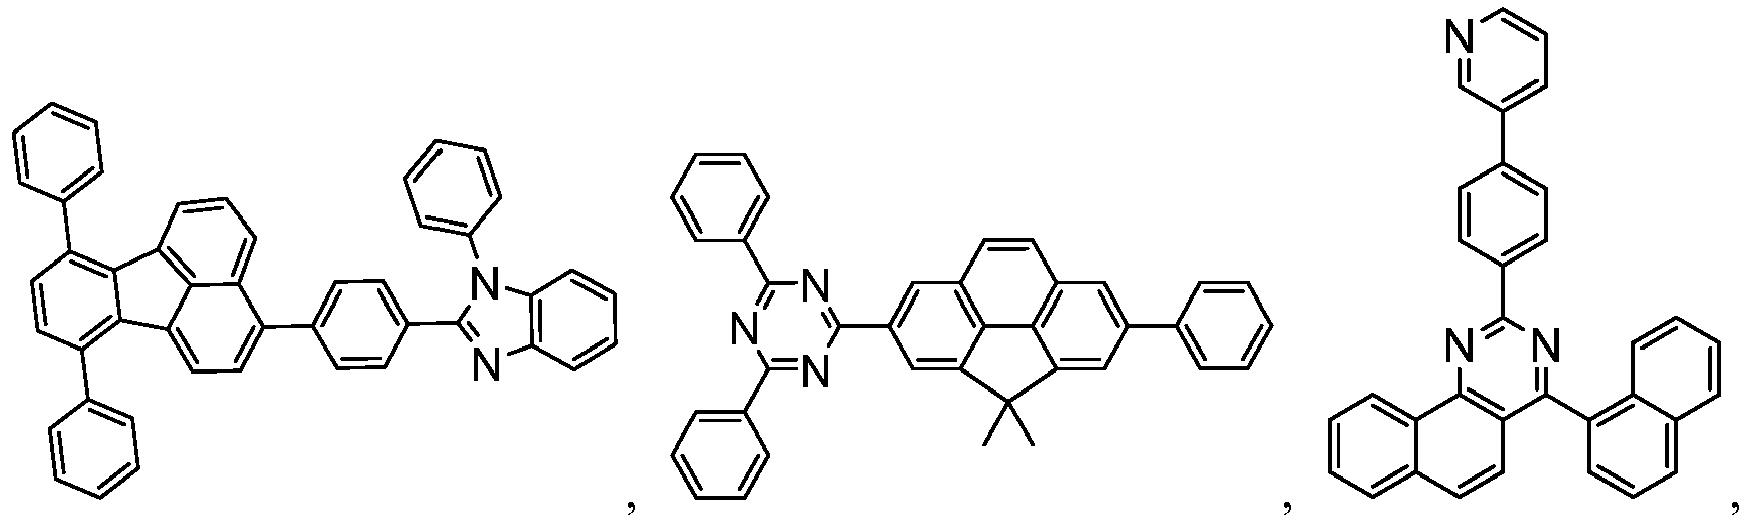 Figure imgb0944